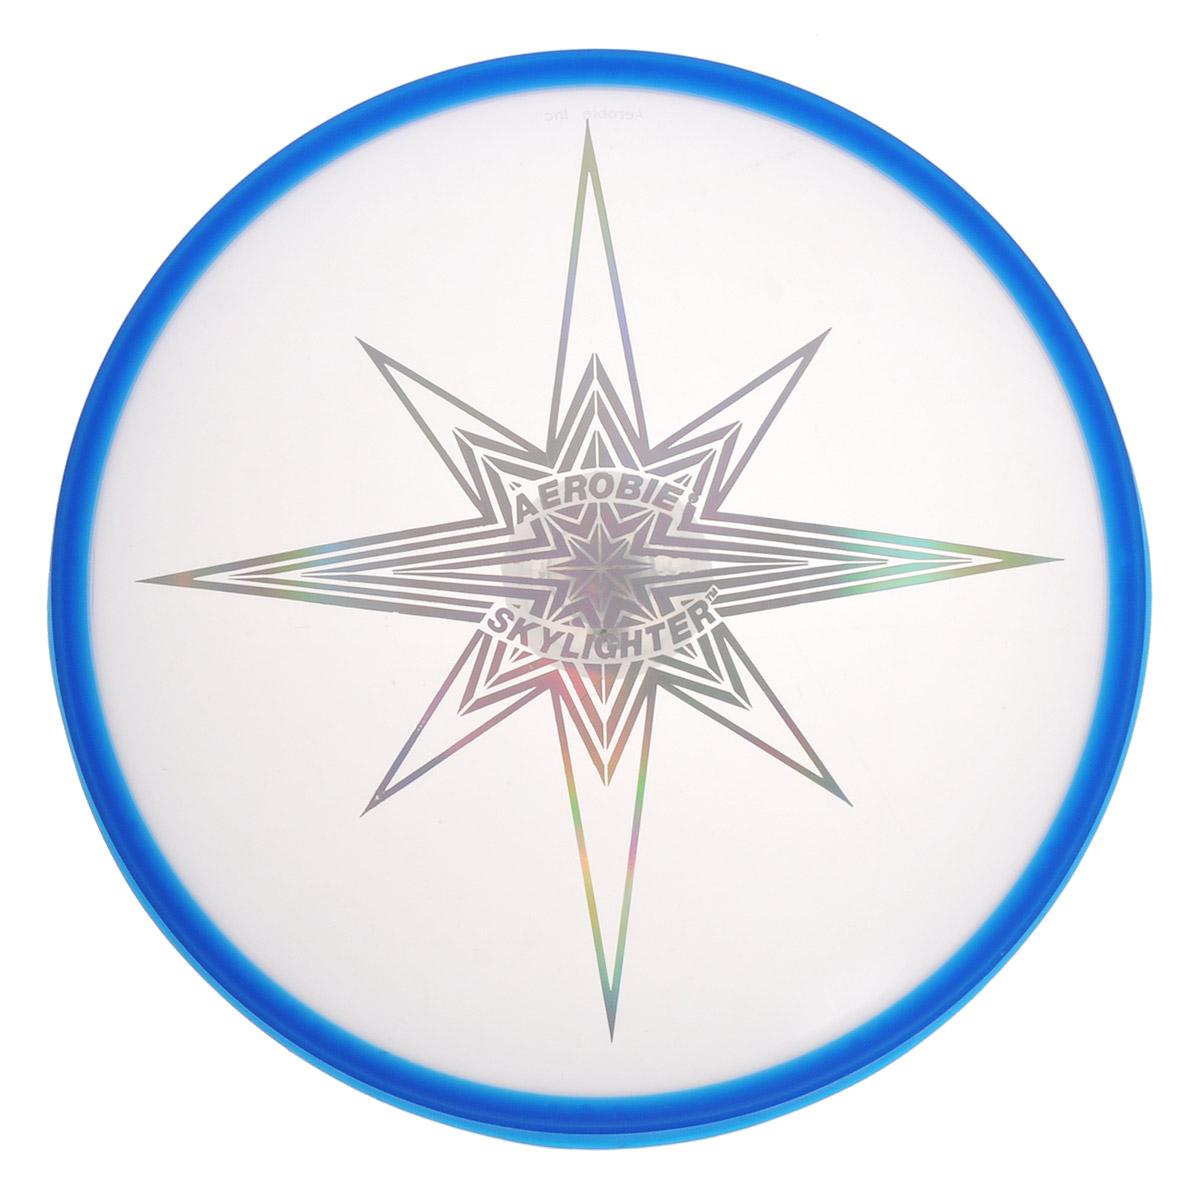 Aerobie Летающий диск Skylighter цвет синий